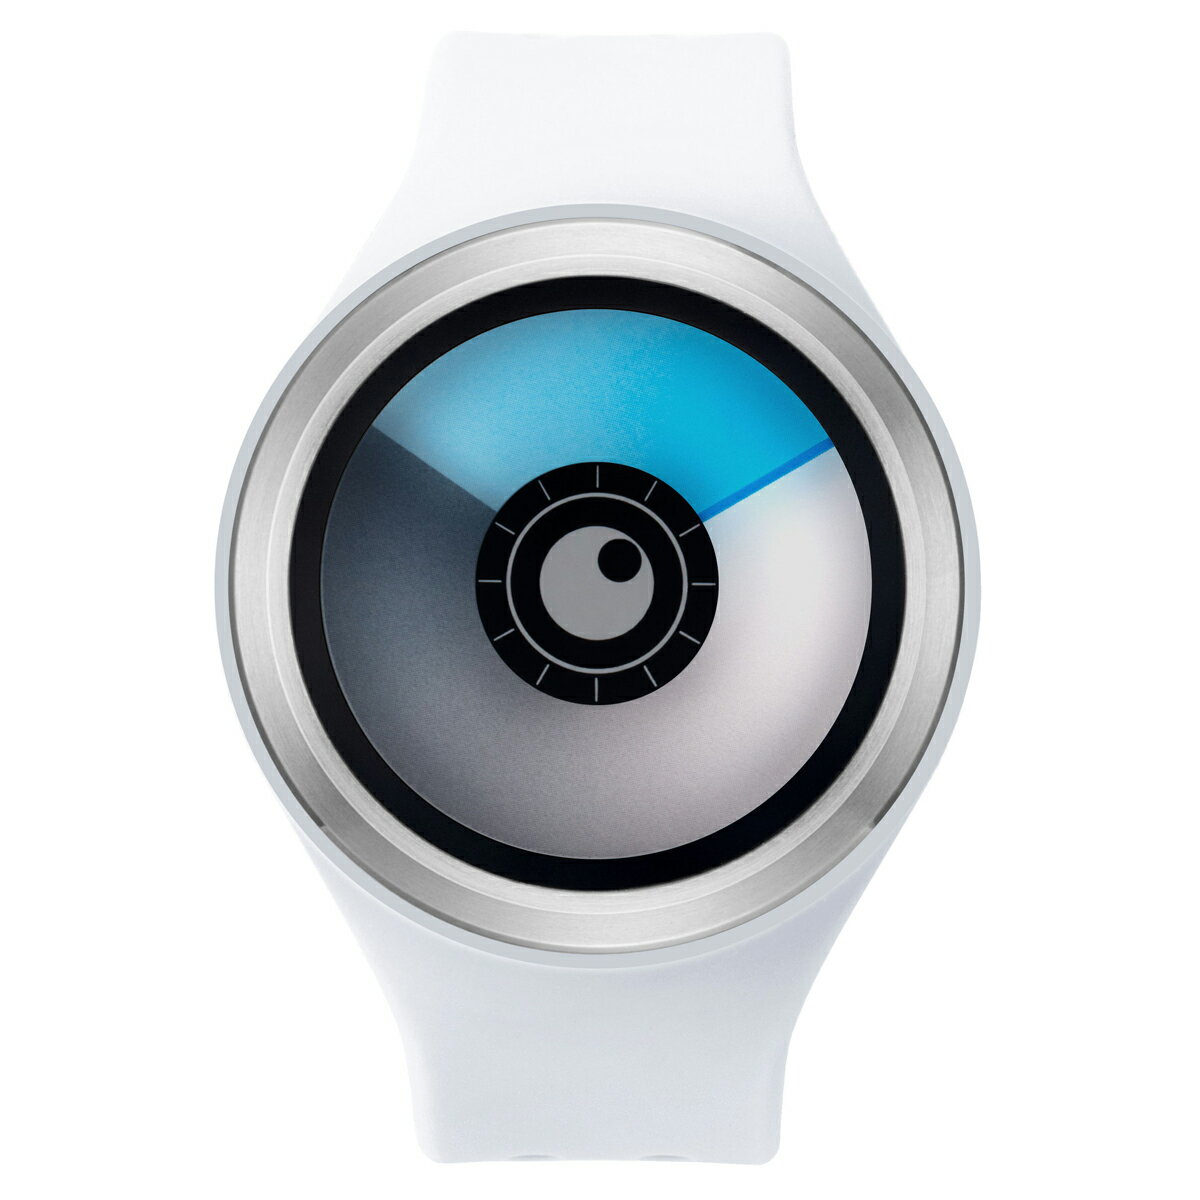 ZEROO AURORA BOREALIS ゼロ 電池式クォーツ 腕時計 [W00705B01SR01] ホワイト デザインウォッチ ペア用 メンズ レディース ユニセックス おしゃれ時計 デザイナーズ